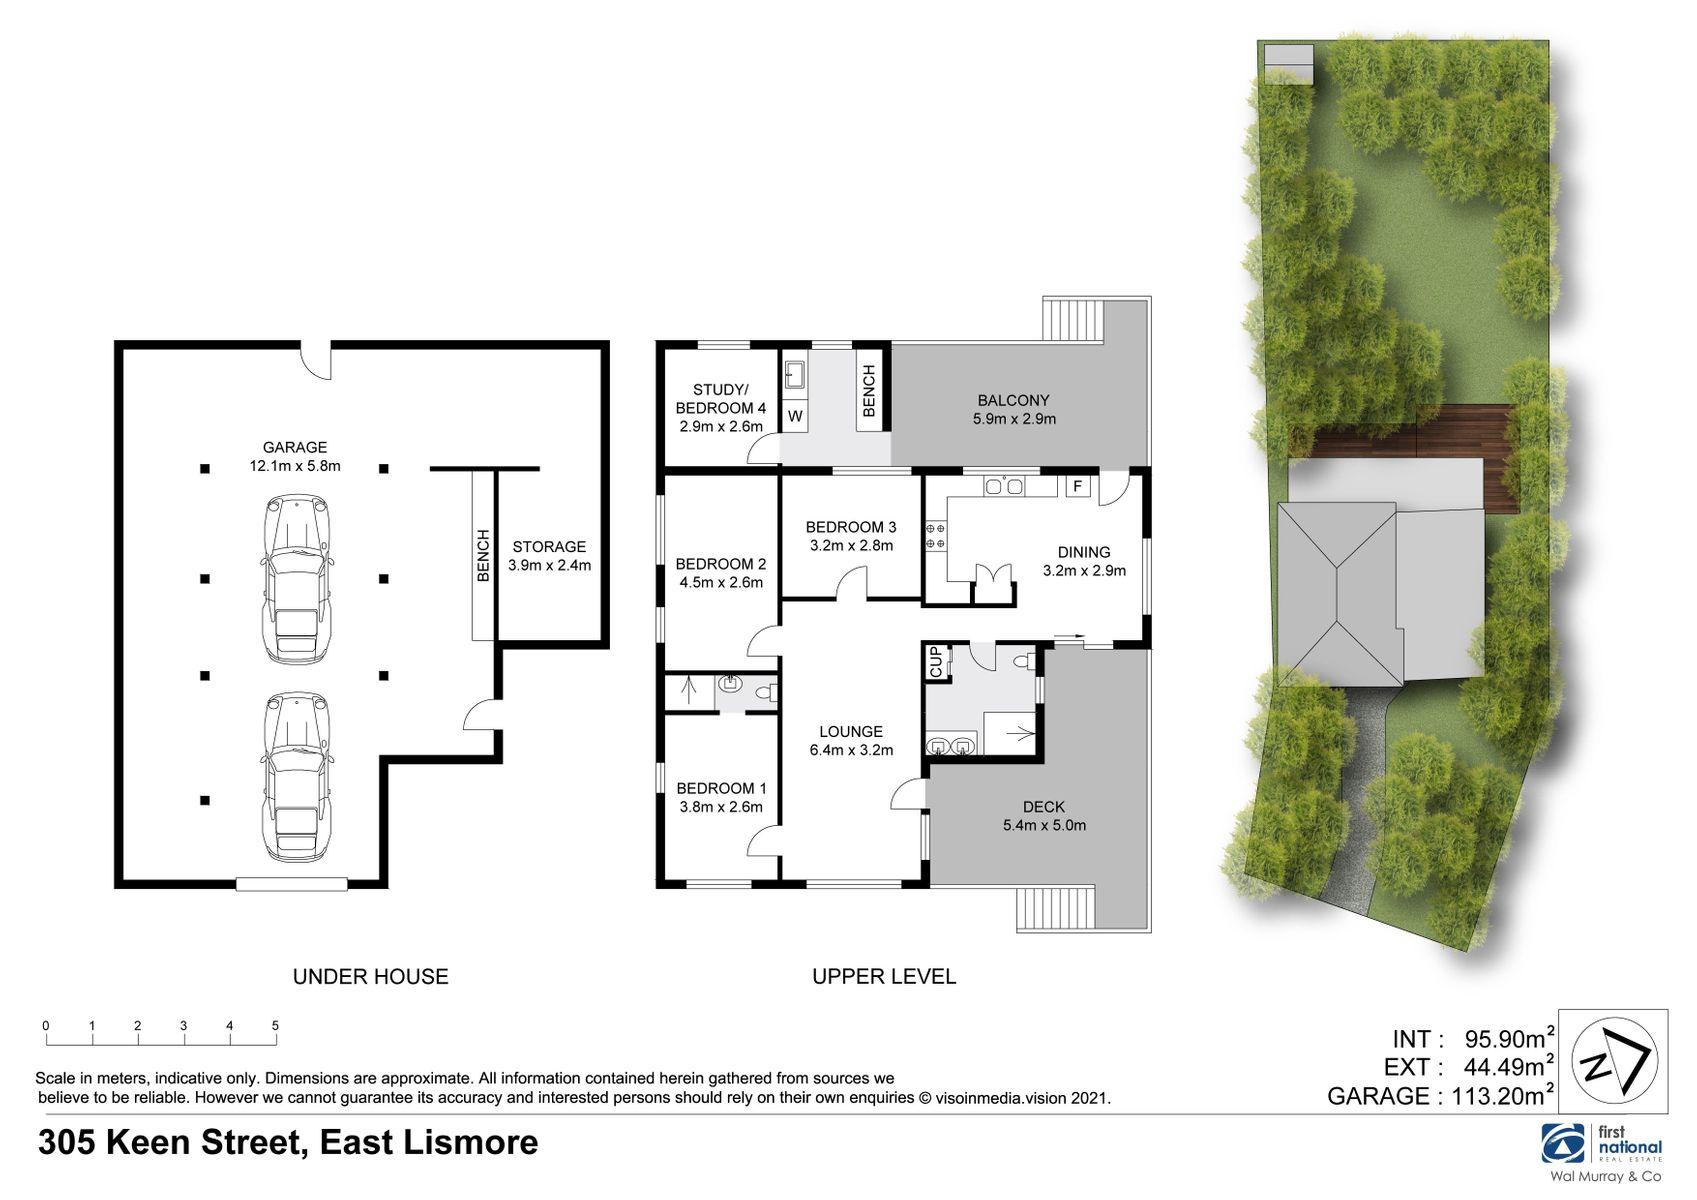 305 Keen Street, Lismore, NSW 2480